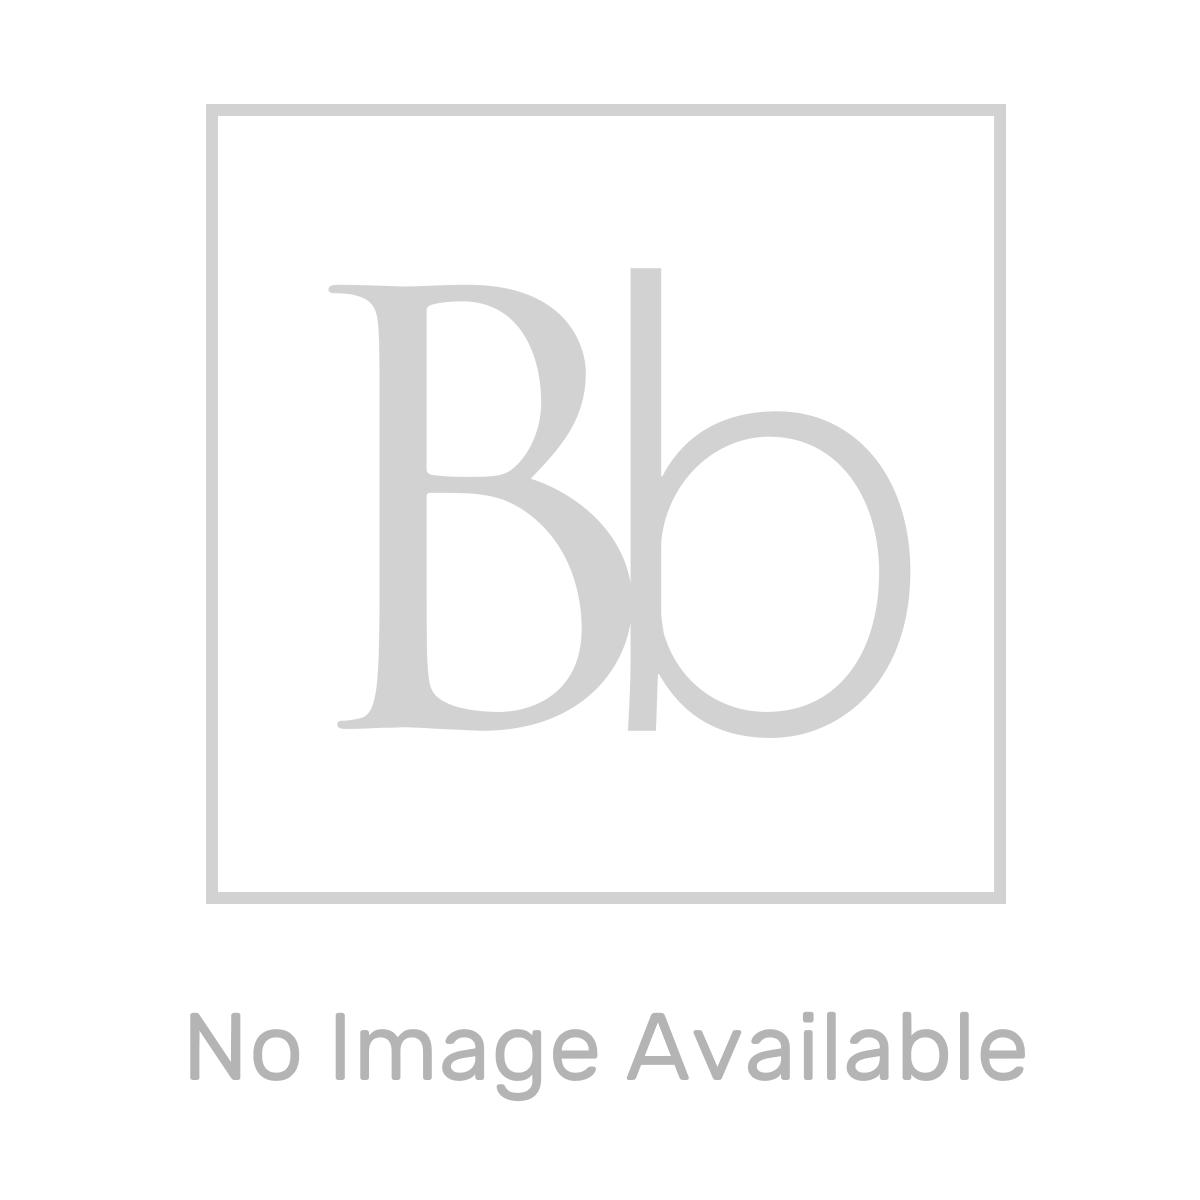 McAlpine WC-CON8F18 4